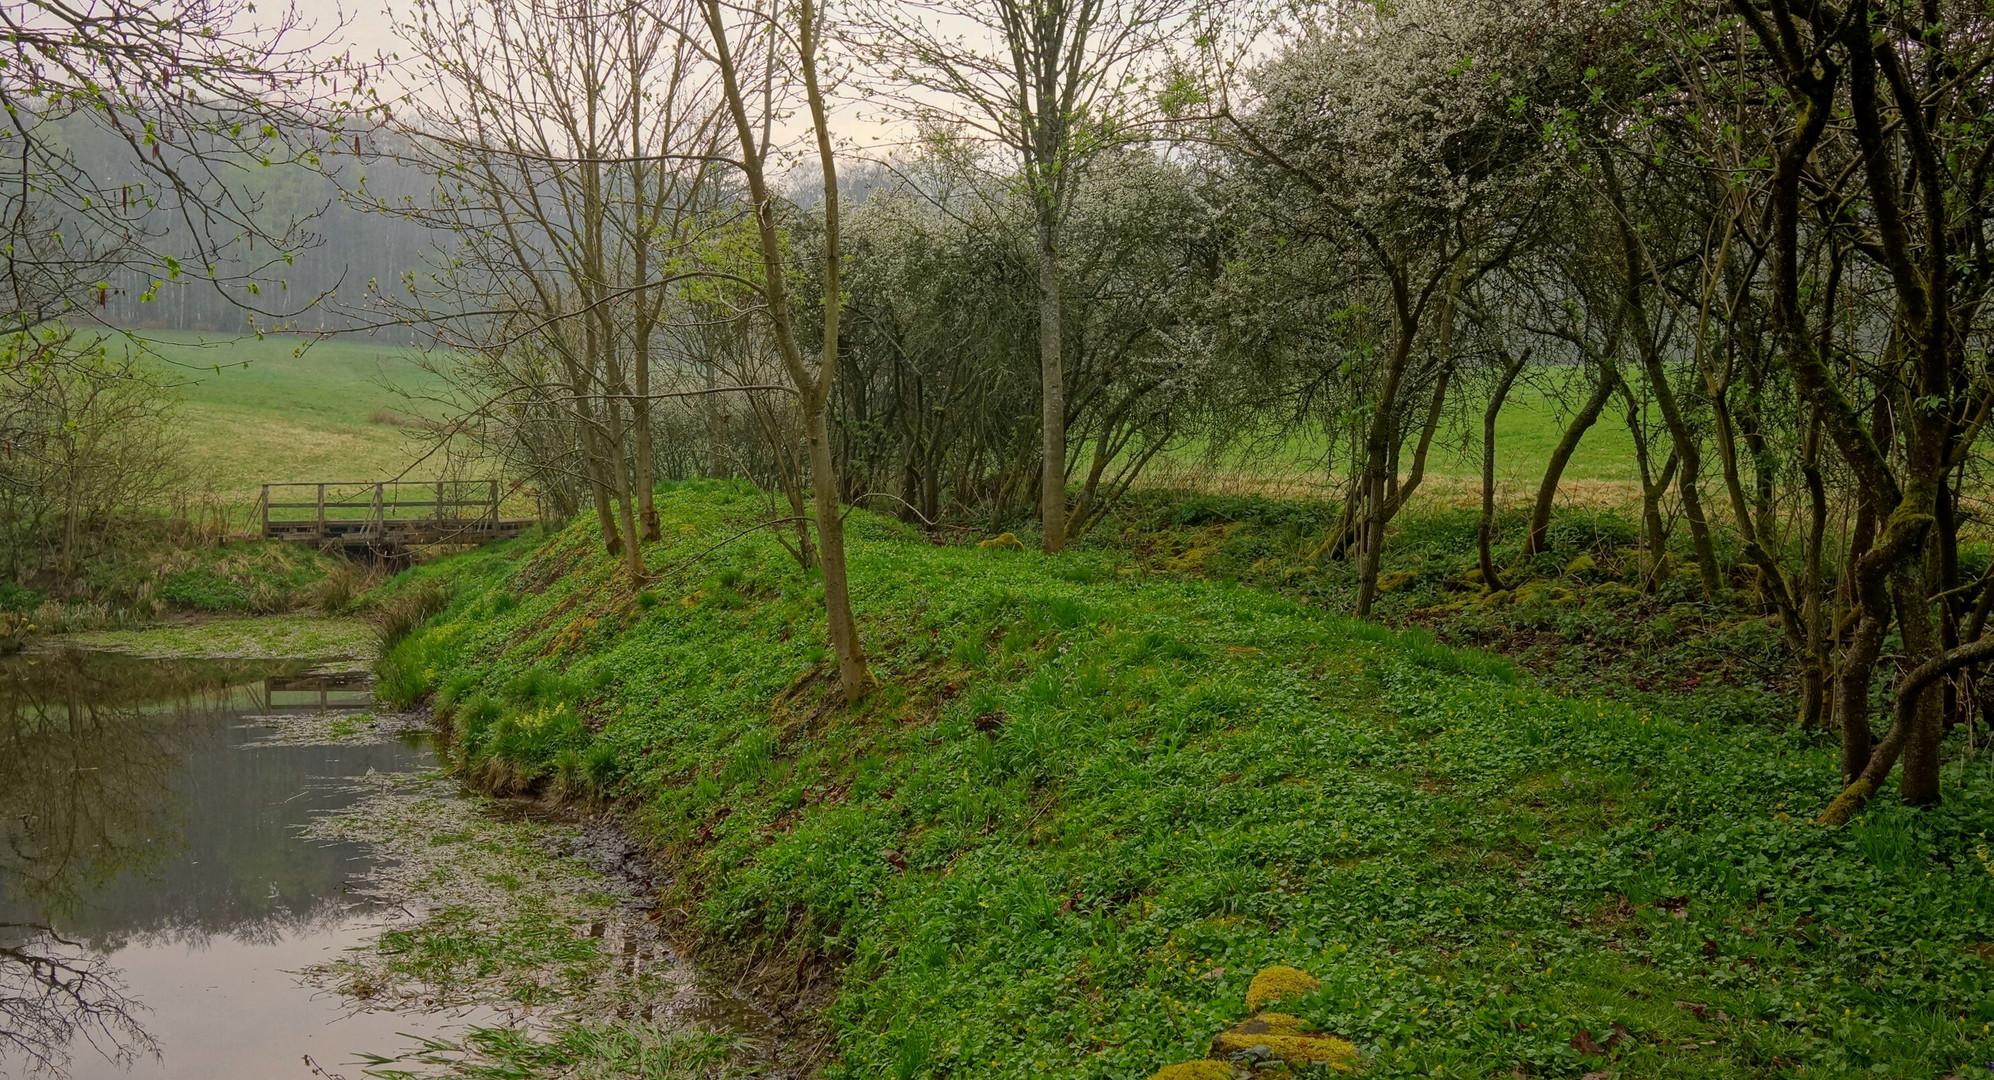 Das Grün des Frühlings IV (el verde de la primavera IV)